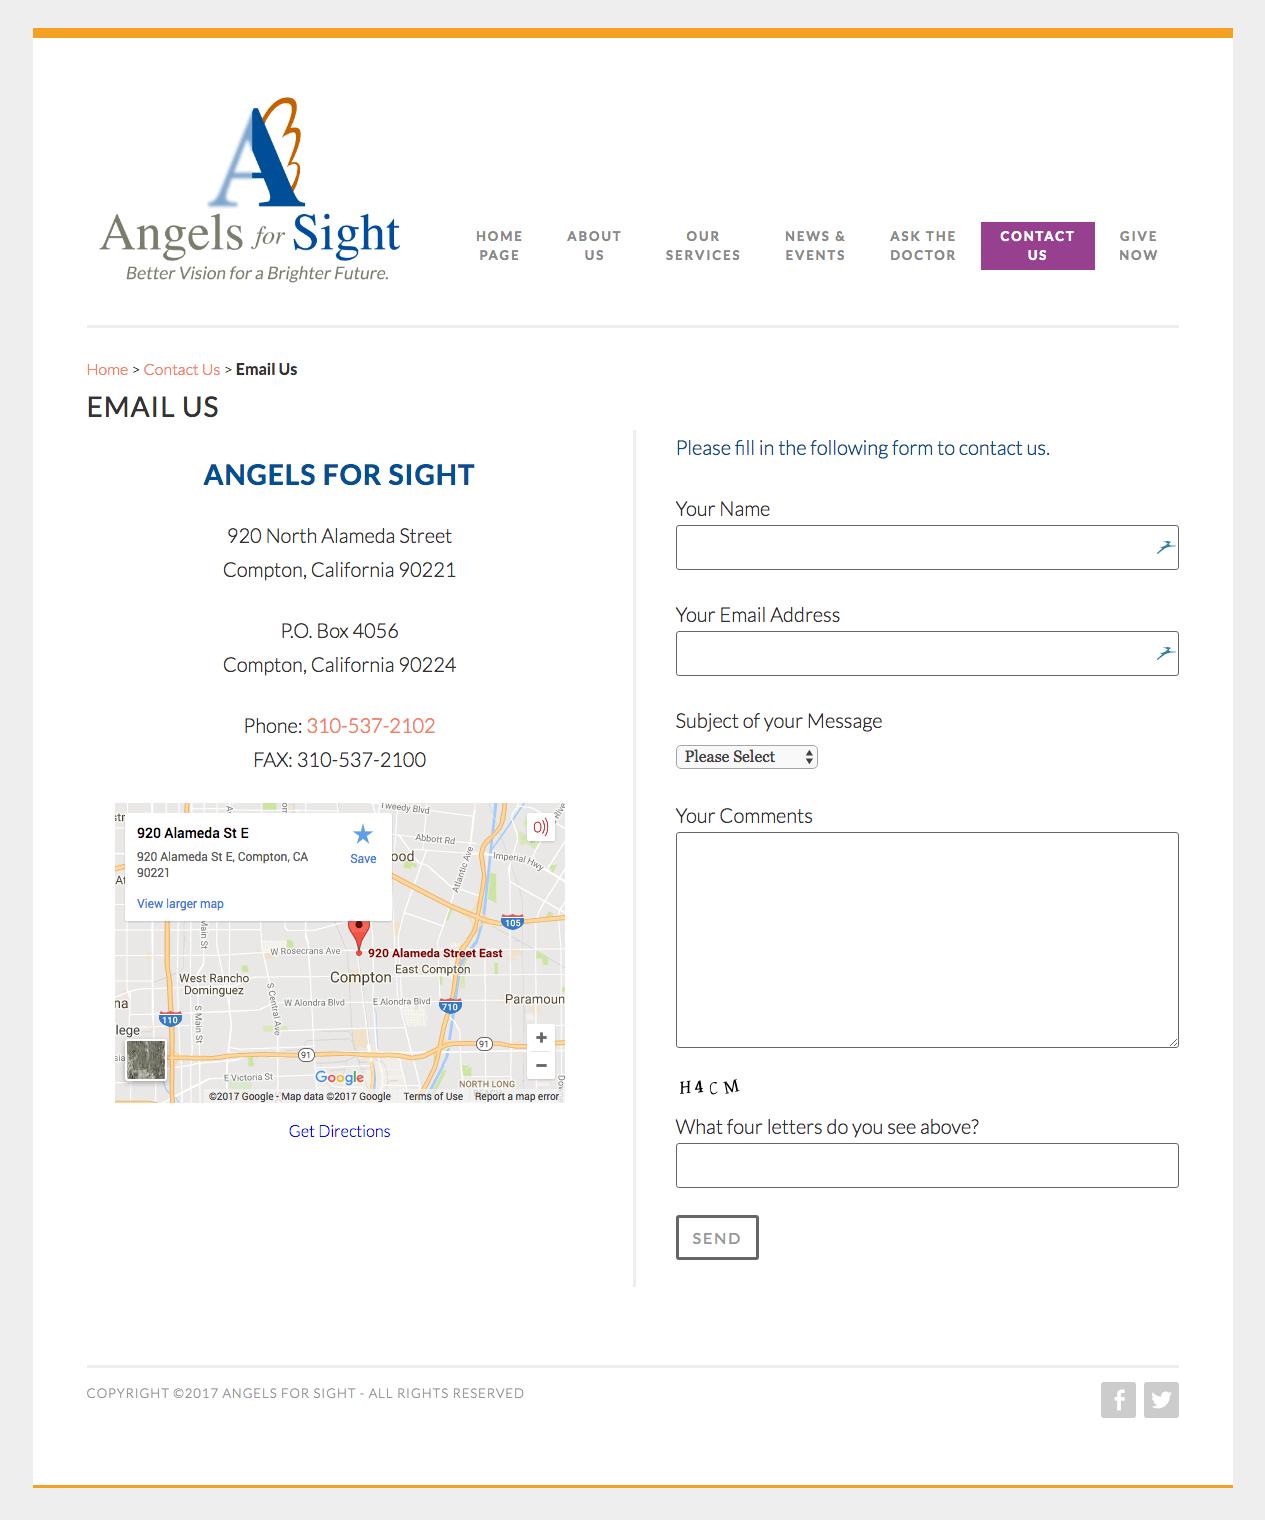 afs-contact-us-post